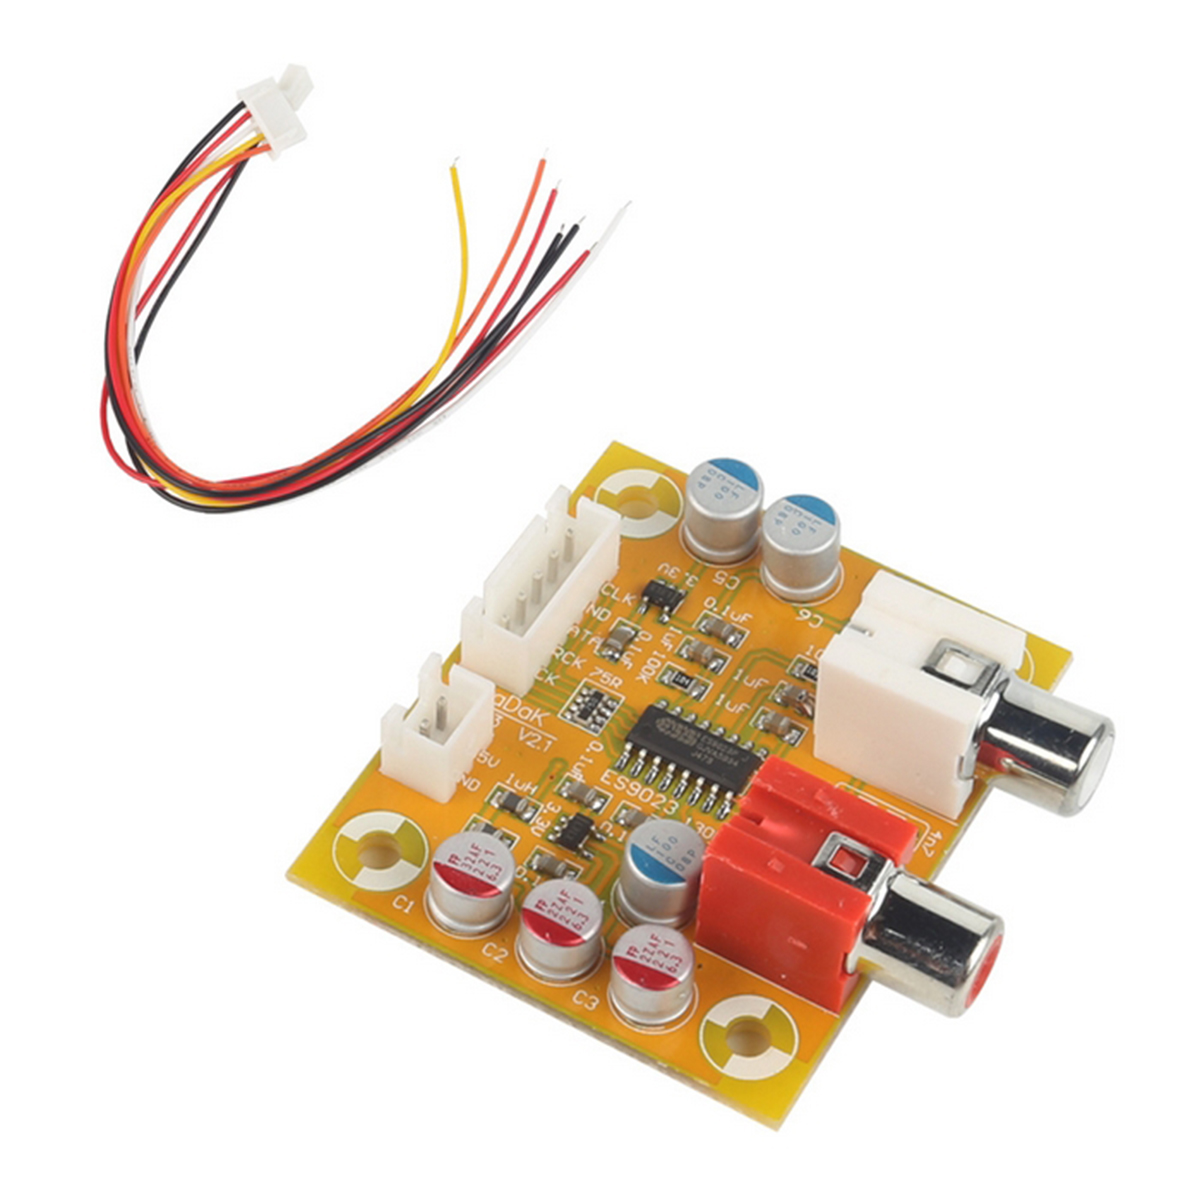 DAC Sabre ES9023 Analog I2S 24 Bit 192 KHz Decoder Board Module For Raspberry Pi